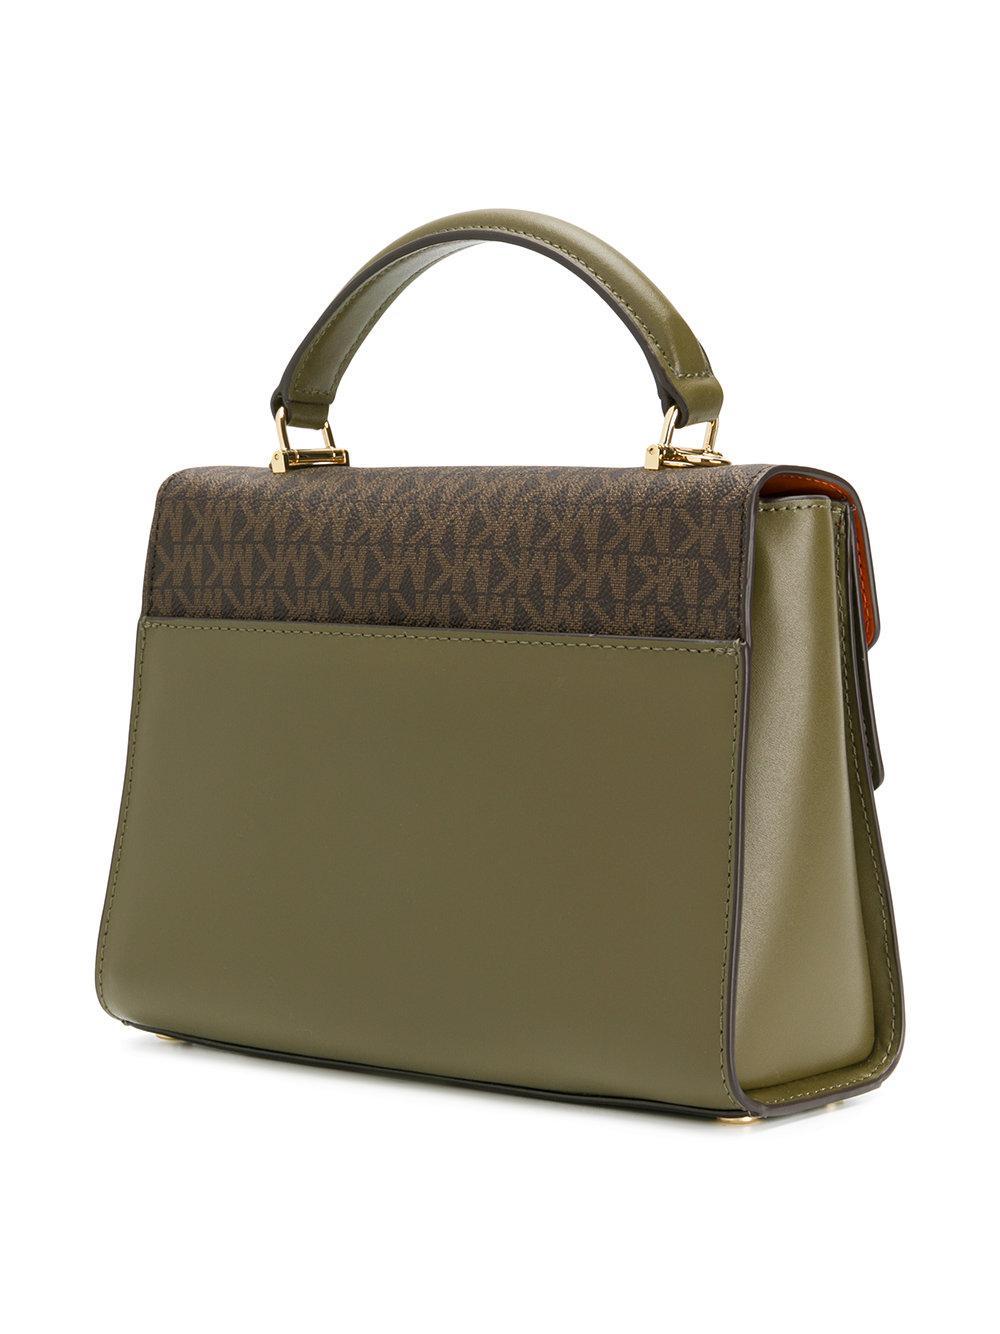 98620407f122 Michael Kors Colourblock Monogram Satchel Bag in Green - Lyst